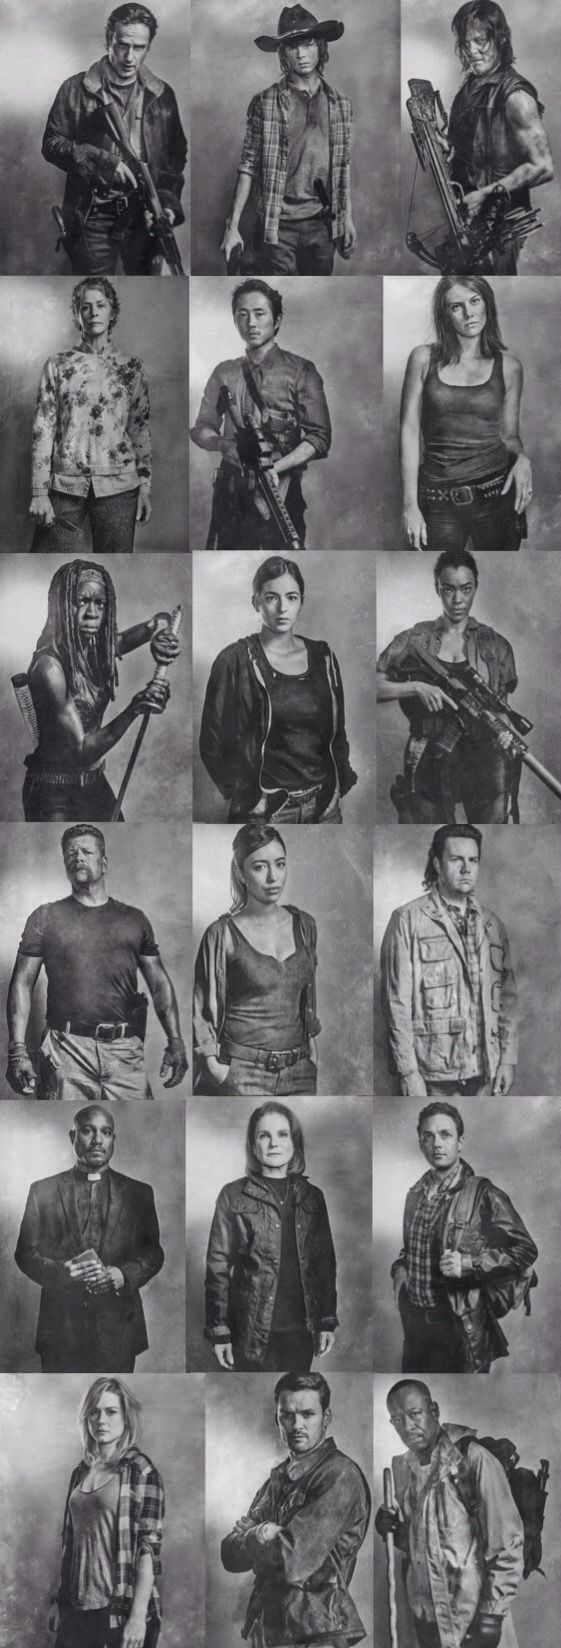 Rick, Carl, Daryl, Carol, Glenn, Maggie, Michone, Tara, Sasha, Abraham, Rosita, Eugene, Gabriel, Deanna, Aaron, Jesse, Spencer, and Morgan. The Walking Dead Season 6